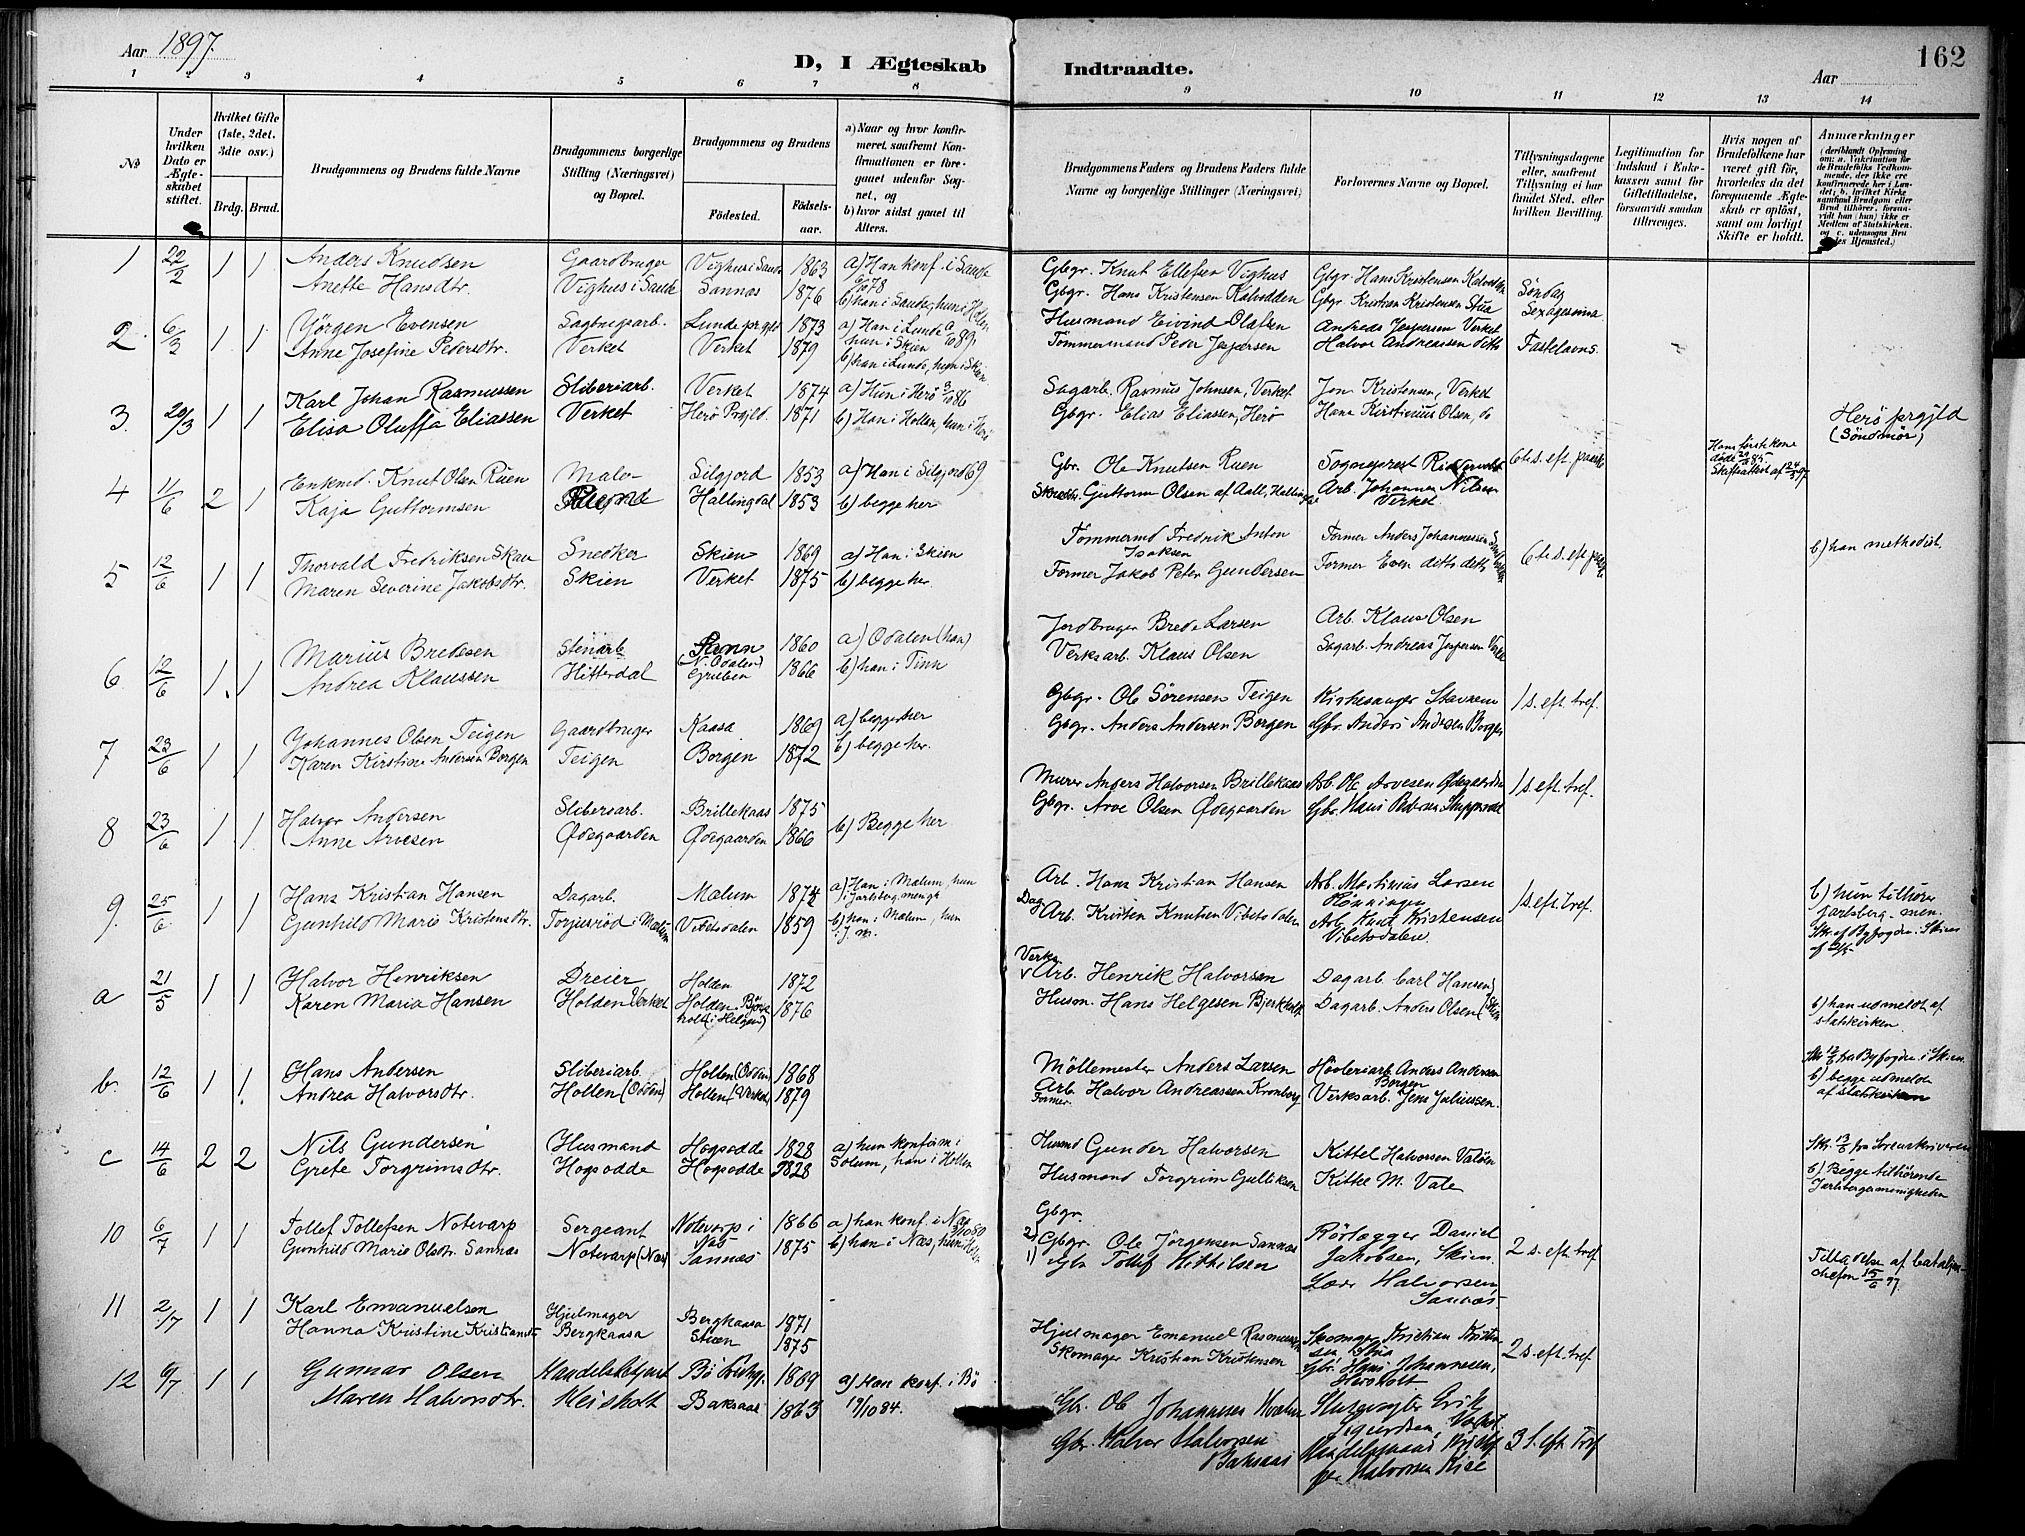 SAKO, Holla kirkebøker, F/Fa/L0010: Ministerialbok nr. 10, 1897-1907, s. 162